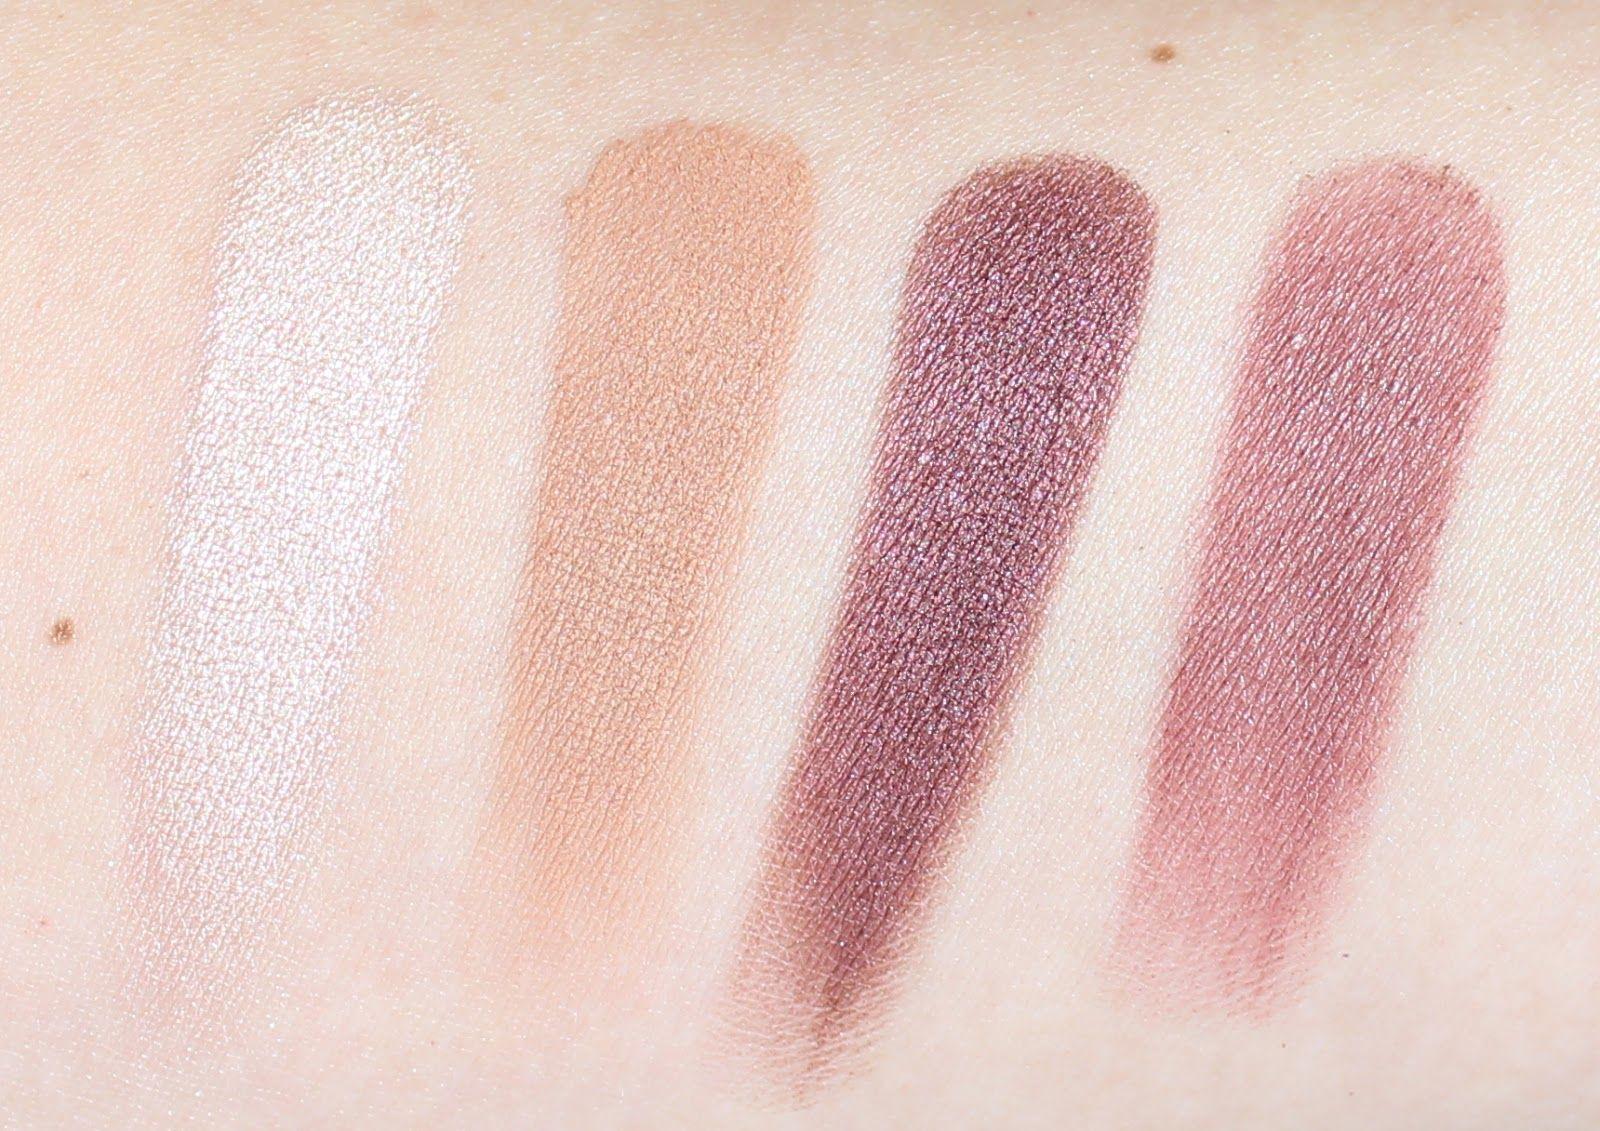 Makeup Geek Eye Shadow Quad Swatches Warm Tones Makeup